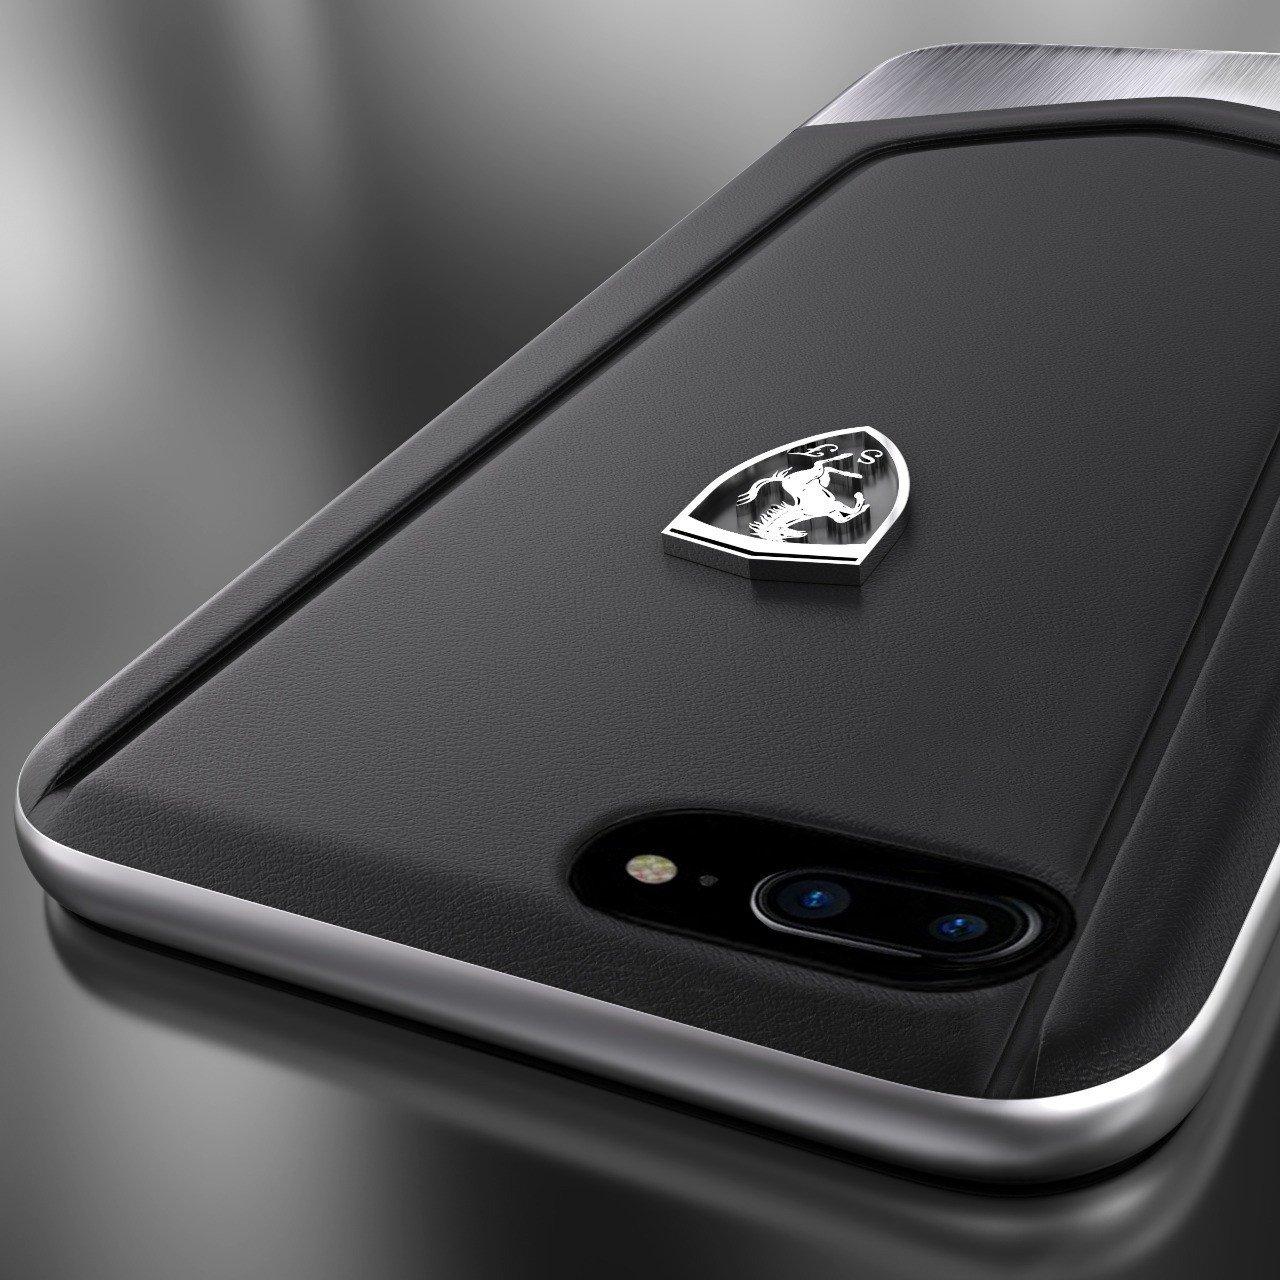 super popular f3fc7 441d4 Ferrari ® Apple iPhone 8 Plus Moranello Series Luxurious Leather + Metal  Case Limited Edition Back Cover